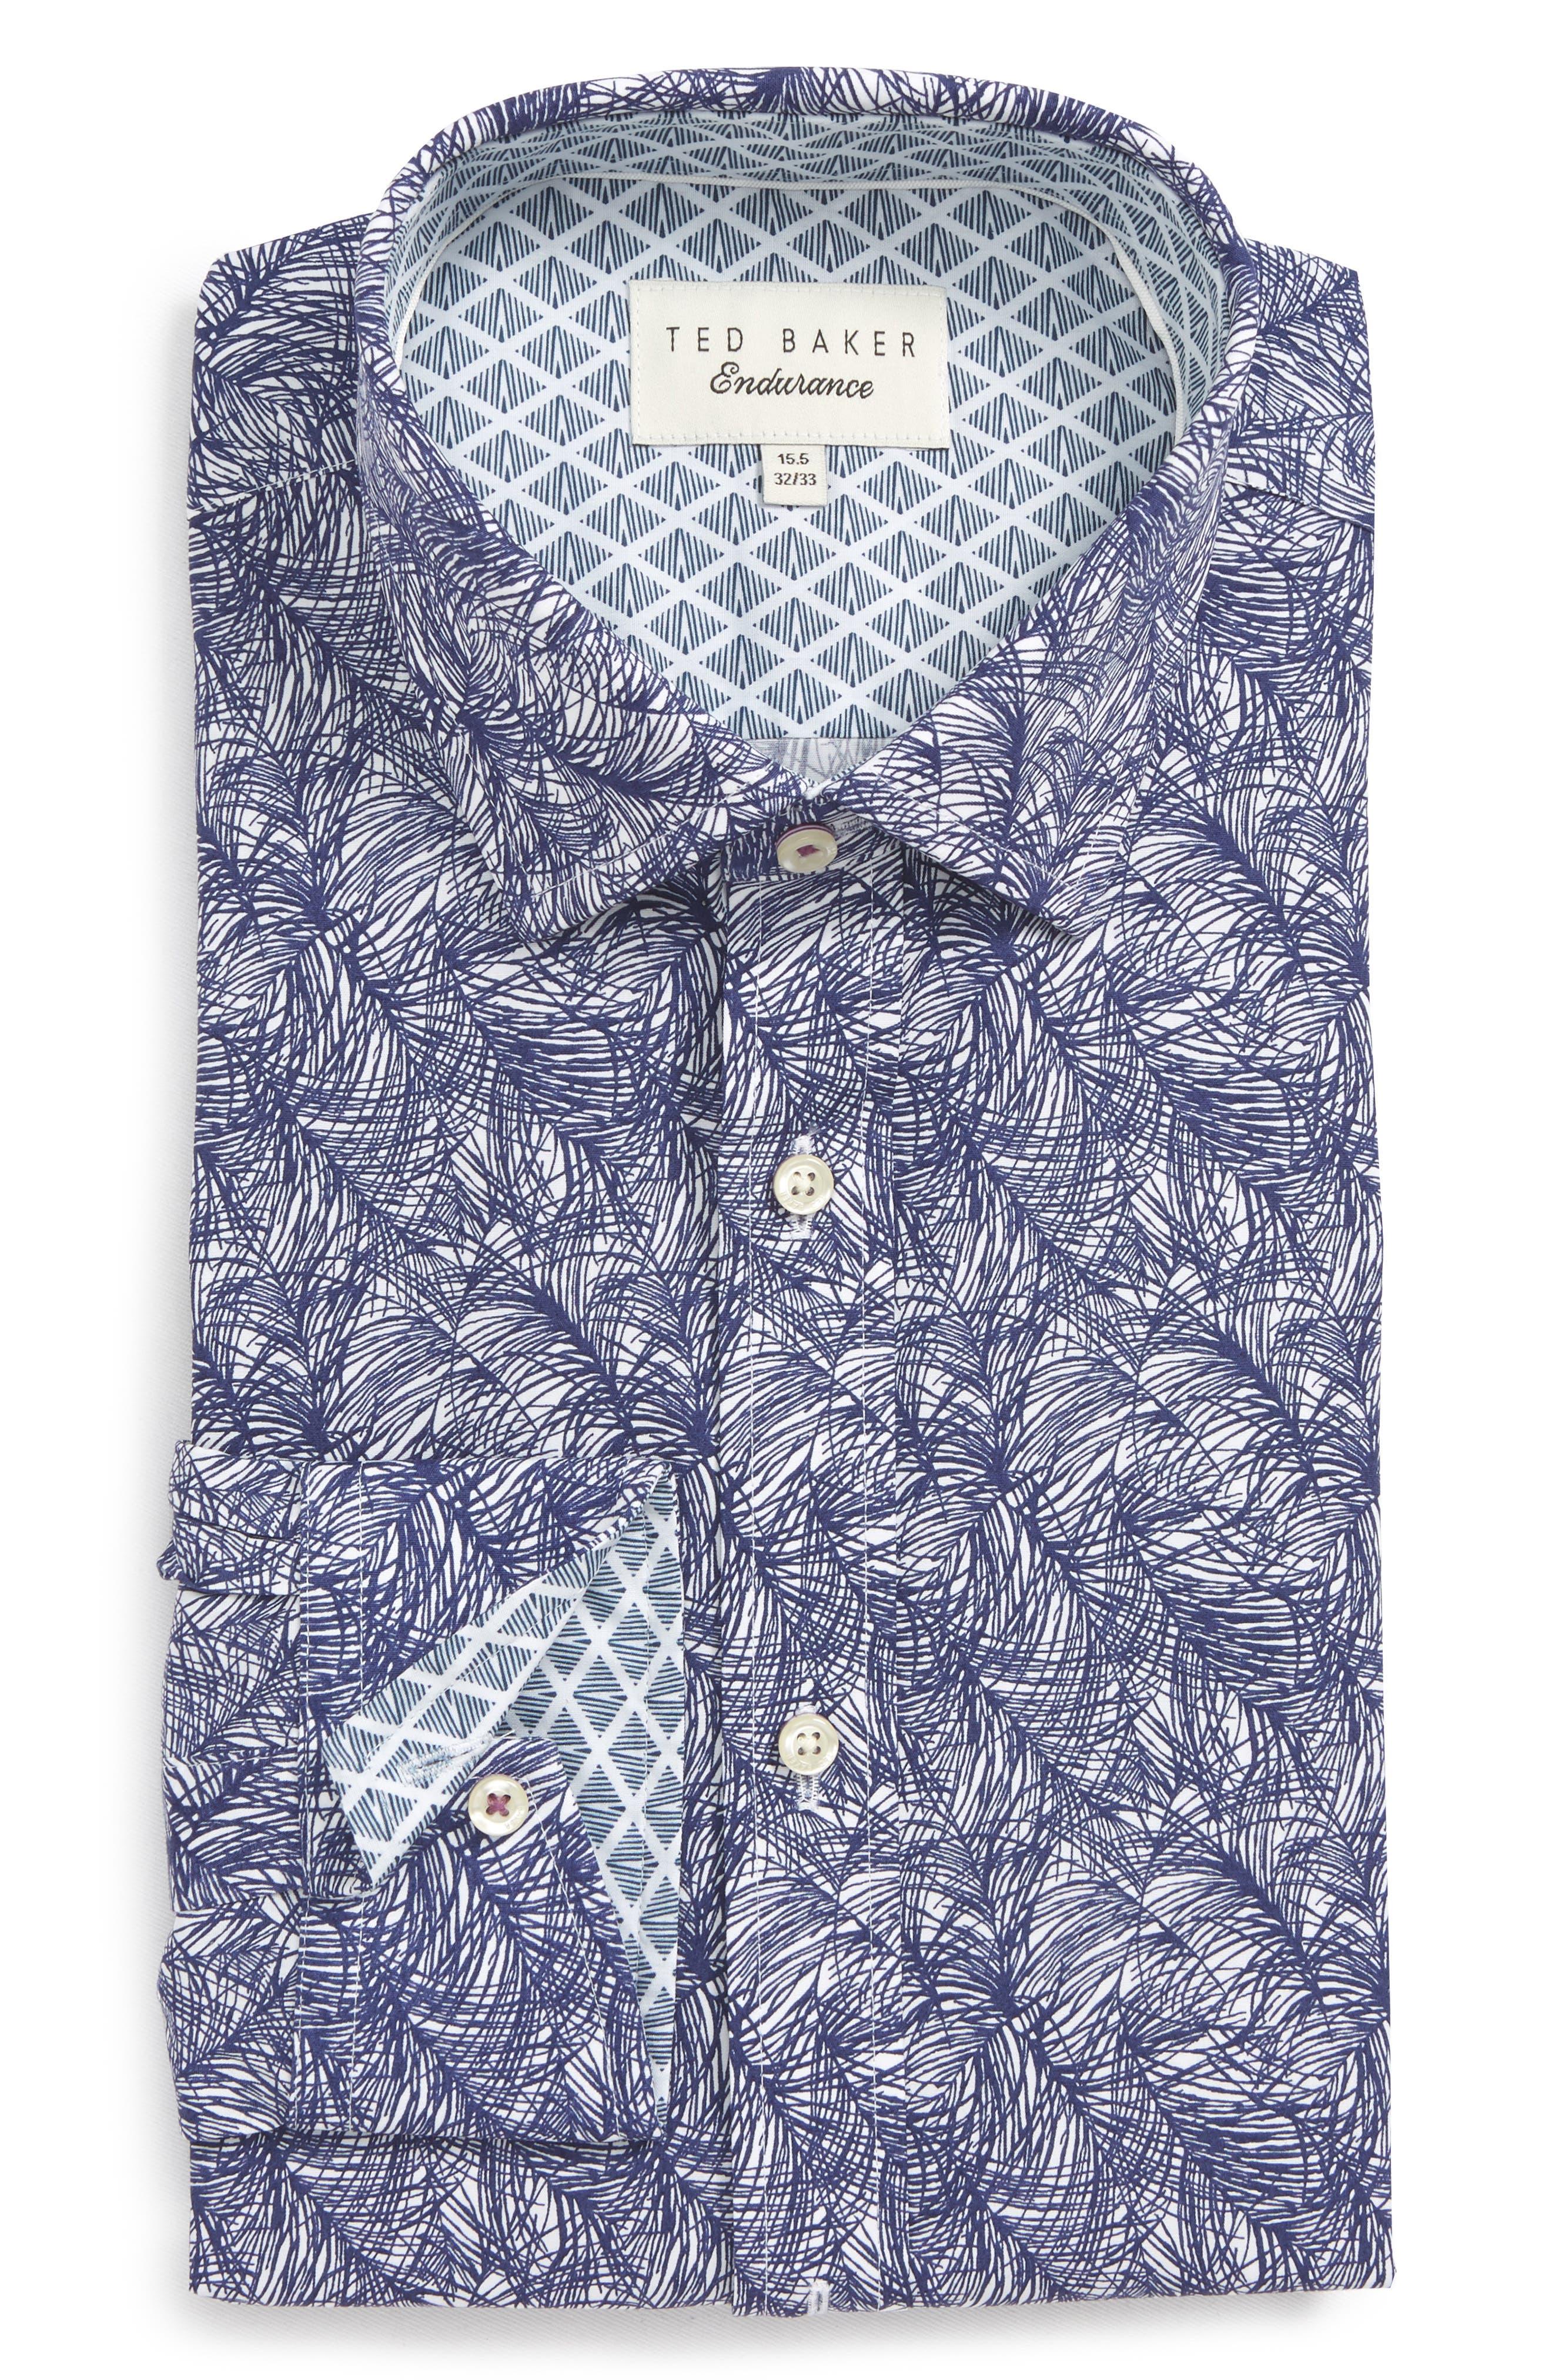 Messera Trim Fit Print Dress Shirt,                             Main thumbnail 1, color,                             410